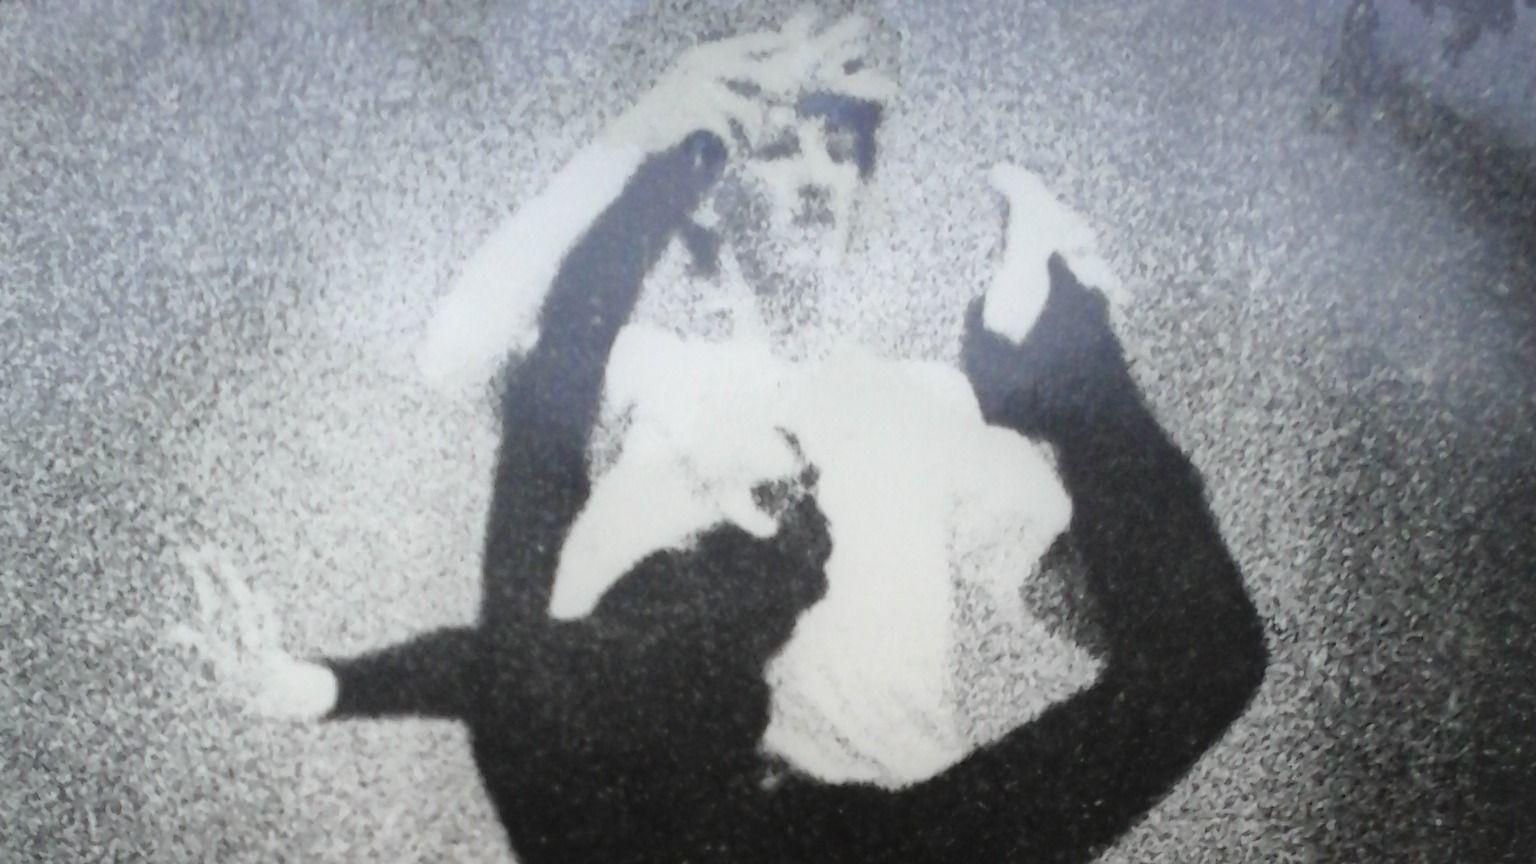 Home dance practice while corona virus